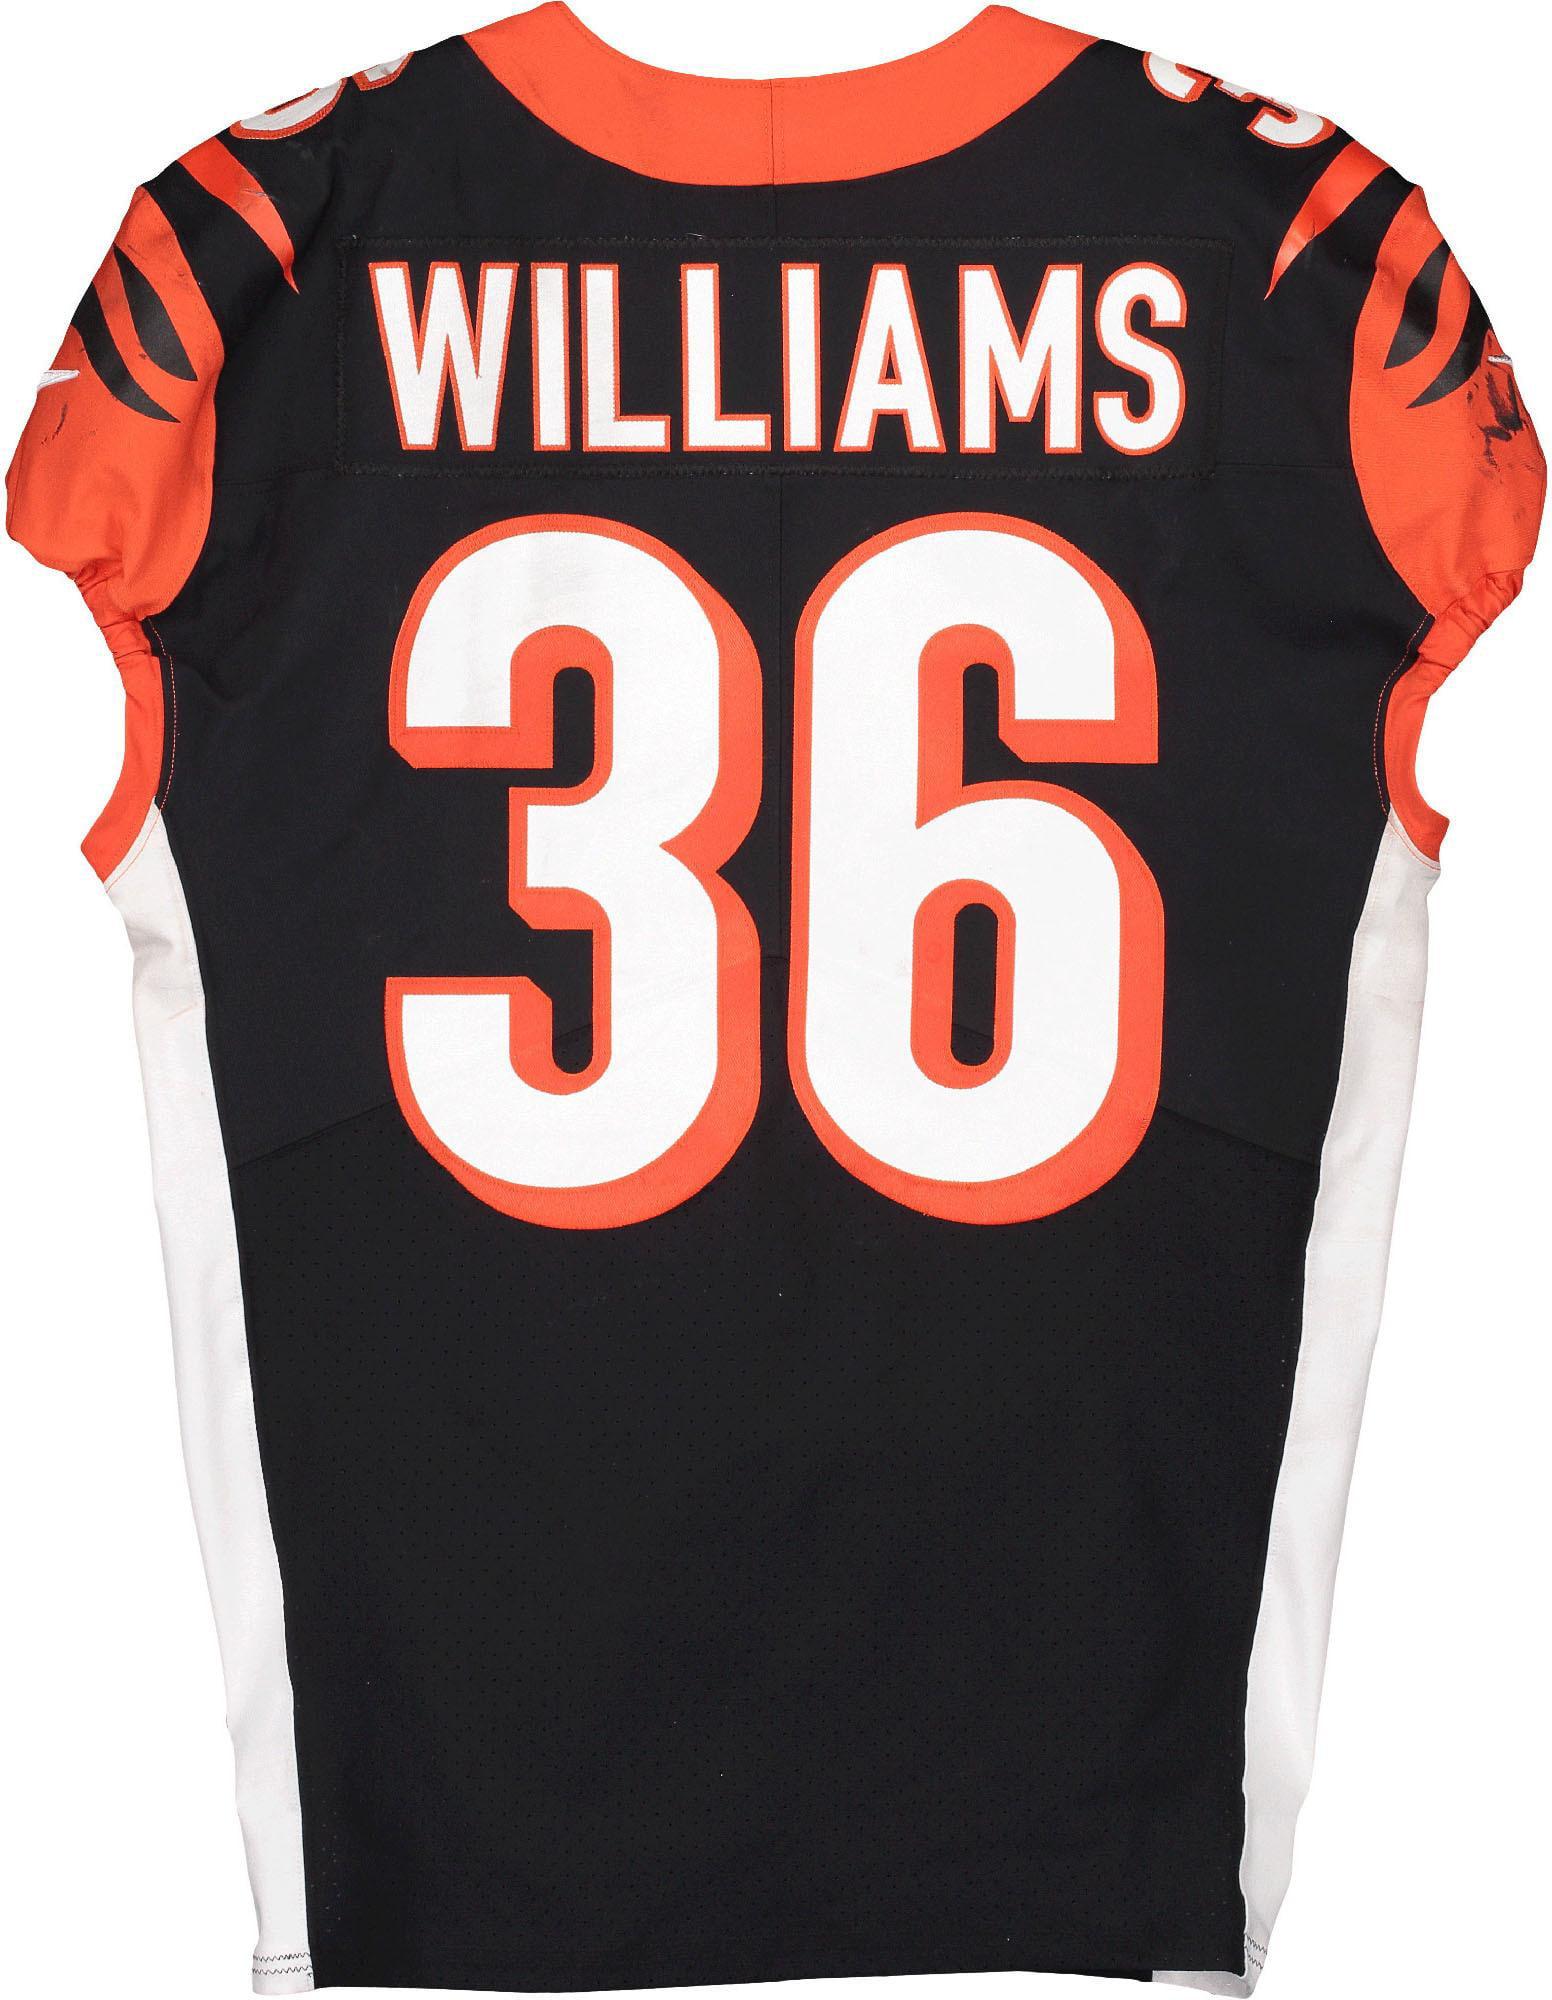 Shawn Williams Cincinnati Bengals Game-Used #36 Jersey vs. Pittsburgh Steelers on November 24, 2019 - Fanatics Authentic Certified - Walmart.com